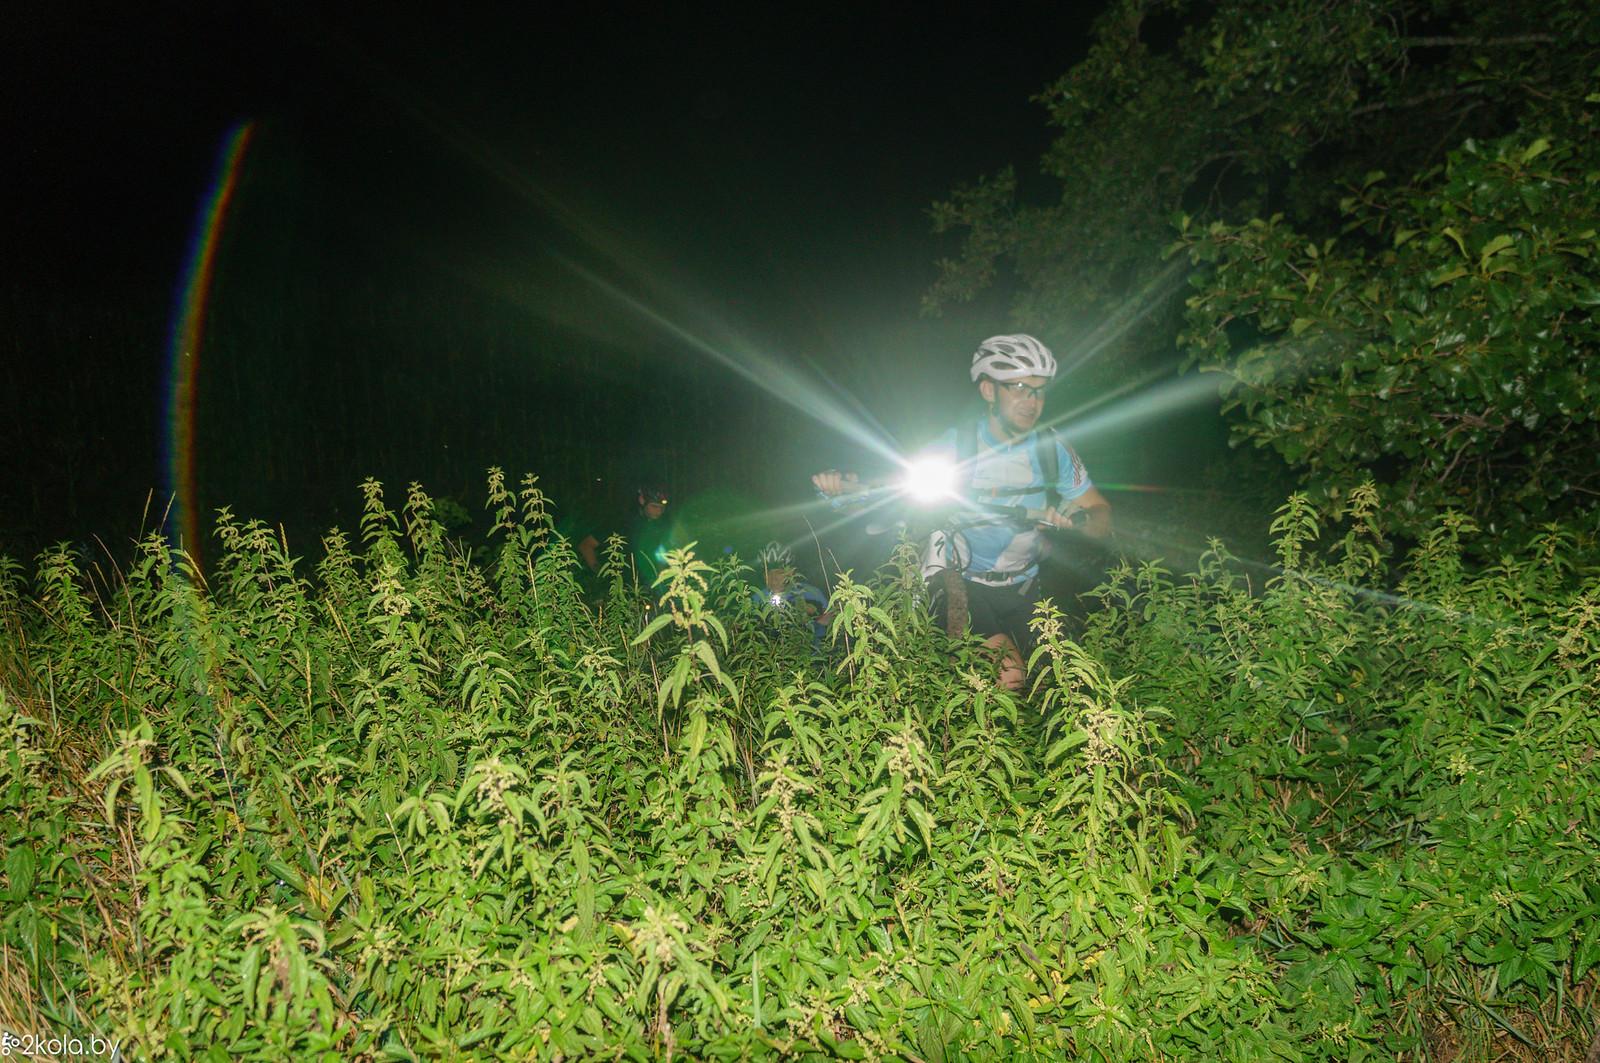 36262339281 2235e4b4e2 h - Ночная велопокатушка 2017 (Тимковичи - Люща)